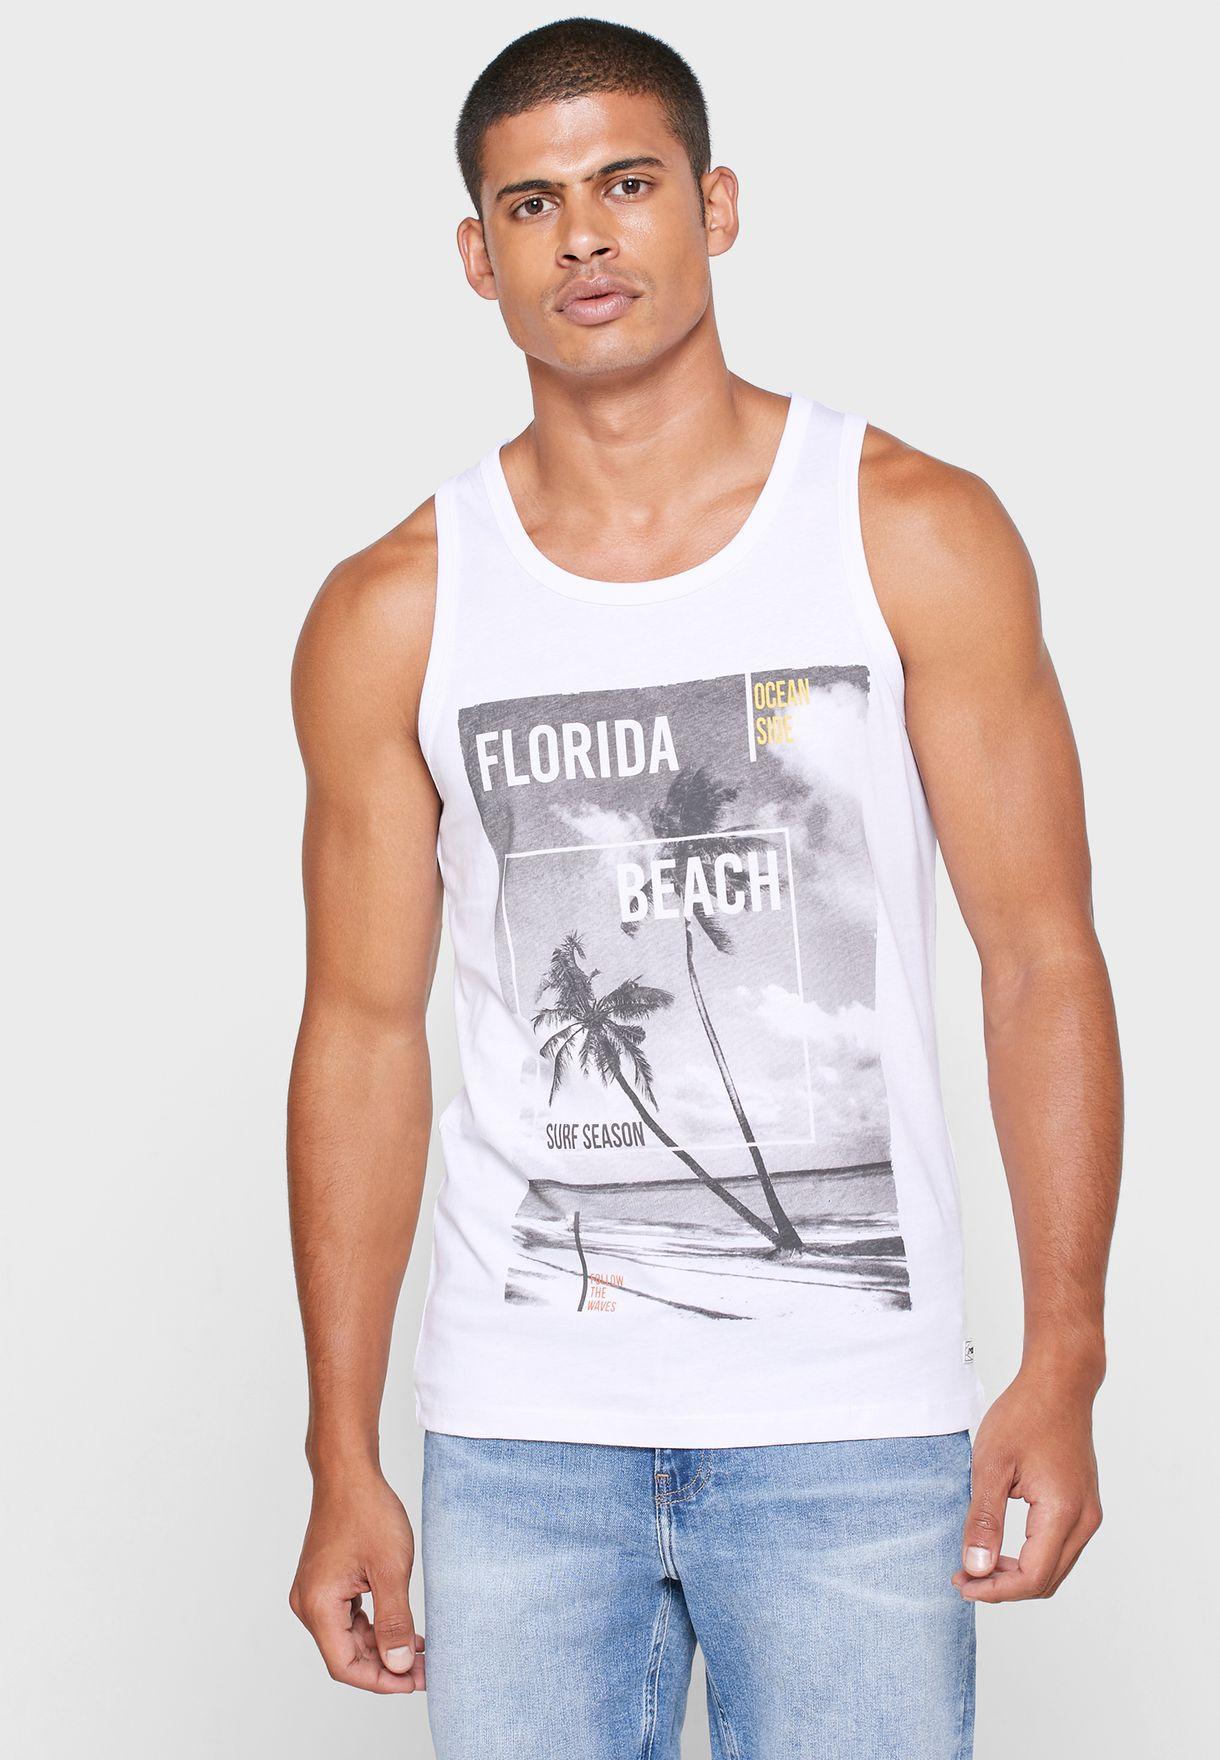 Florida Beach Vest